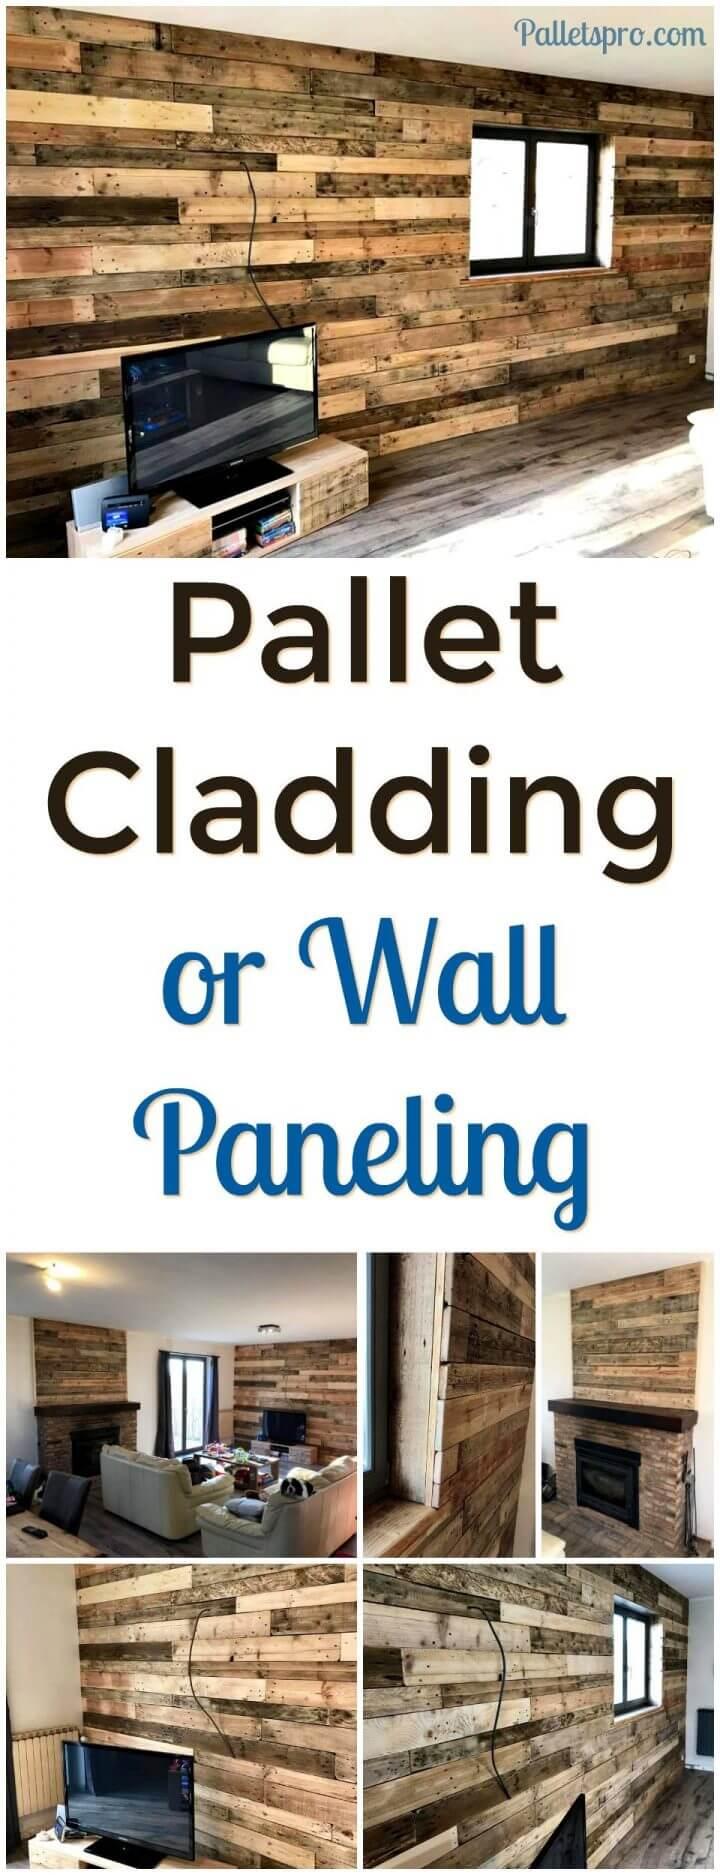 pallet wall paneling idea